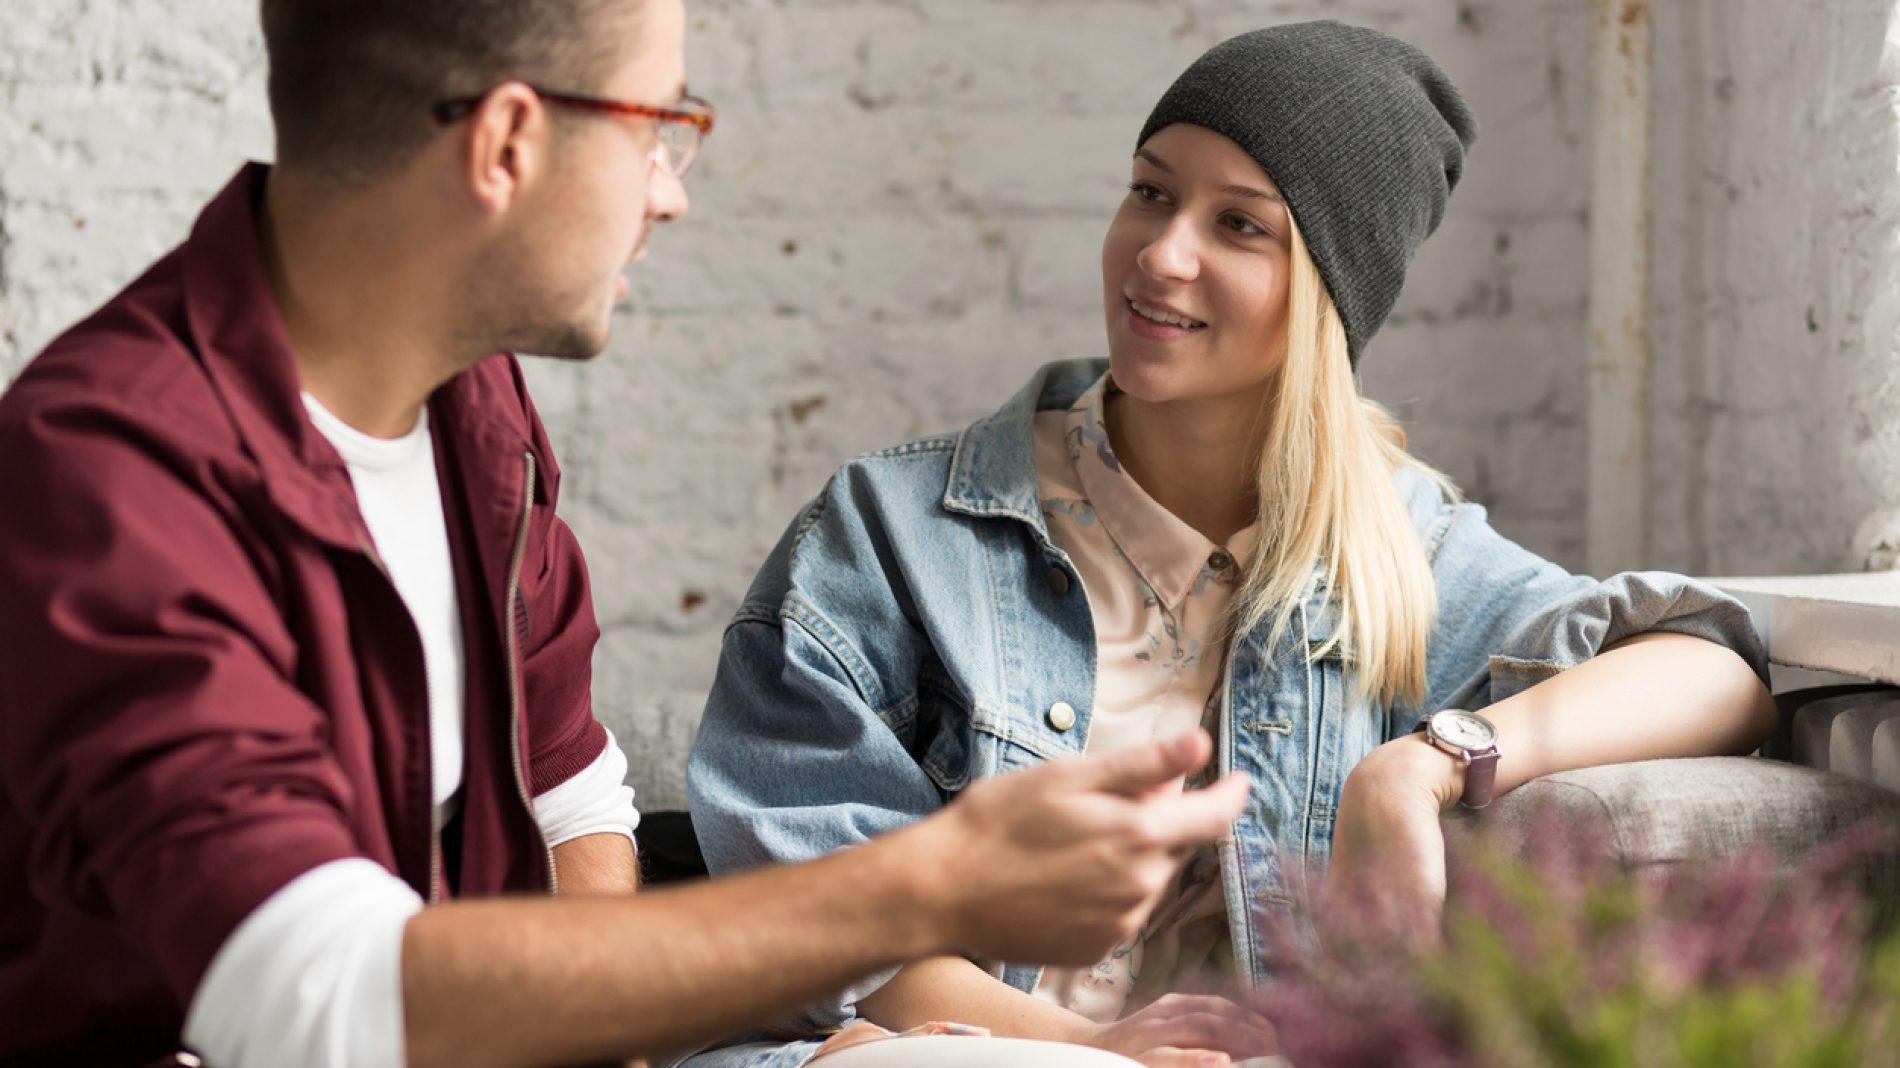 Talking in cafe